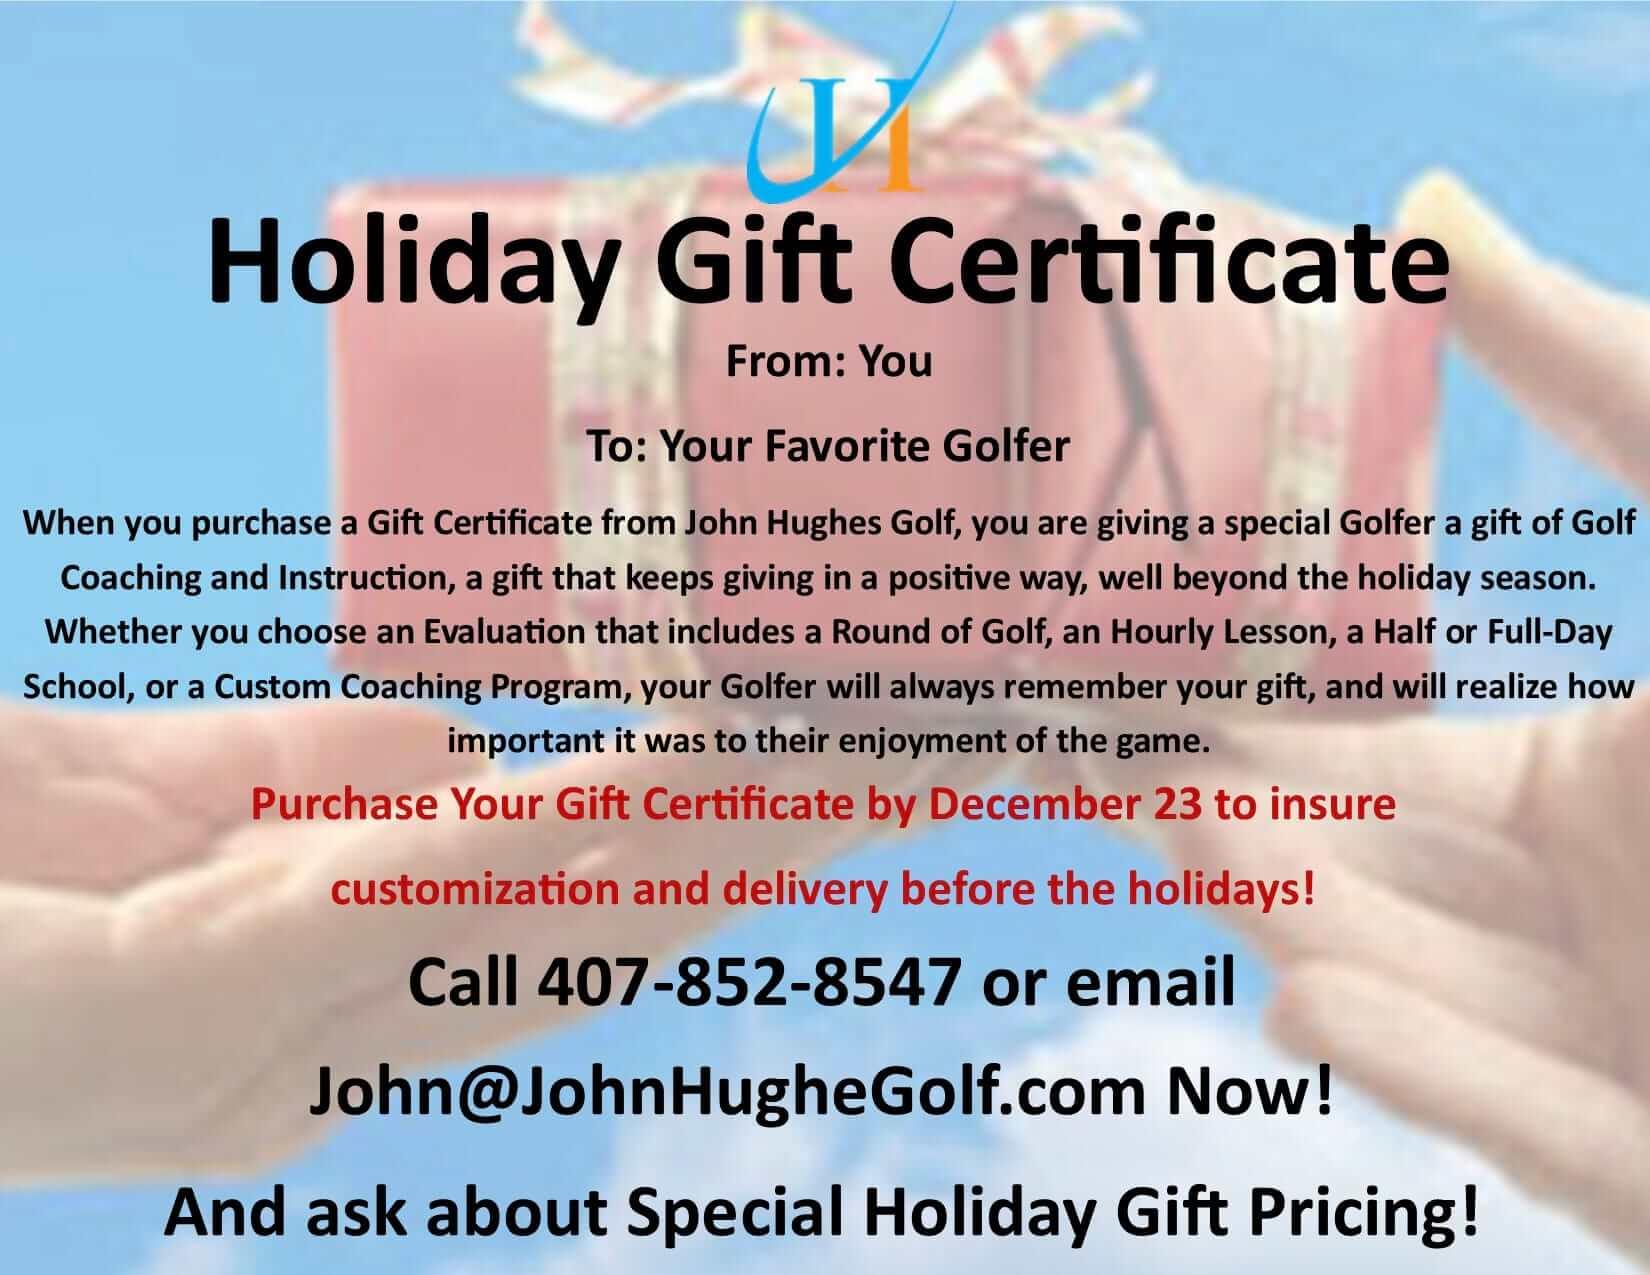 blog john hughes golf john hughes golf christmas gift certificates holiday gifts holiday gift certificates orlando